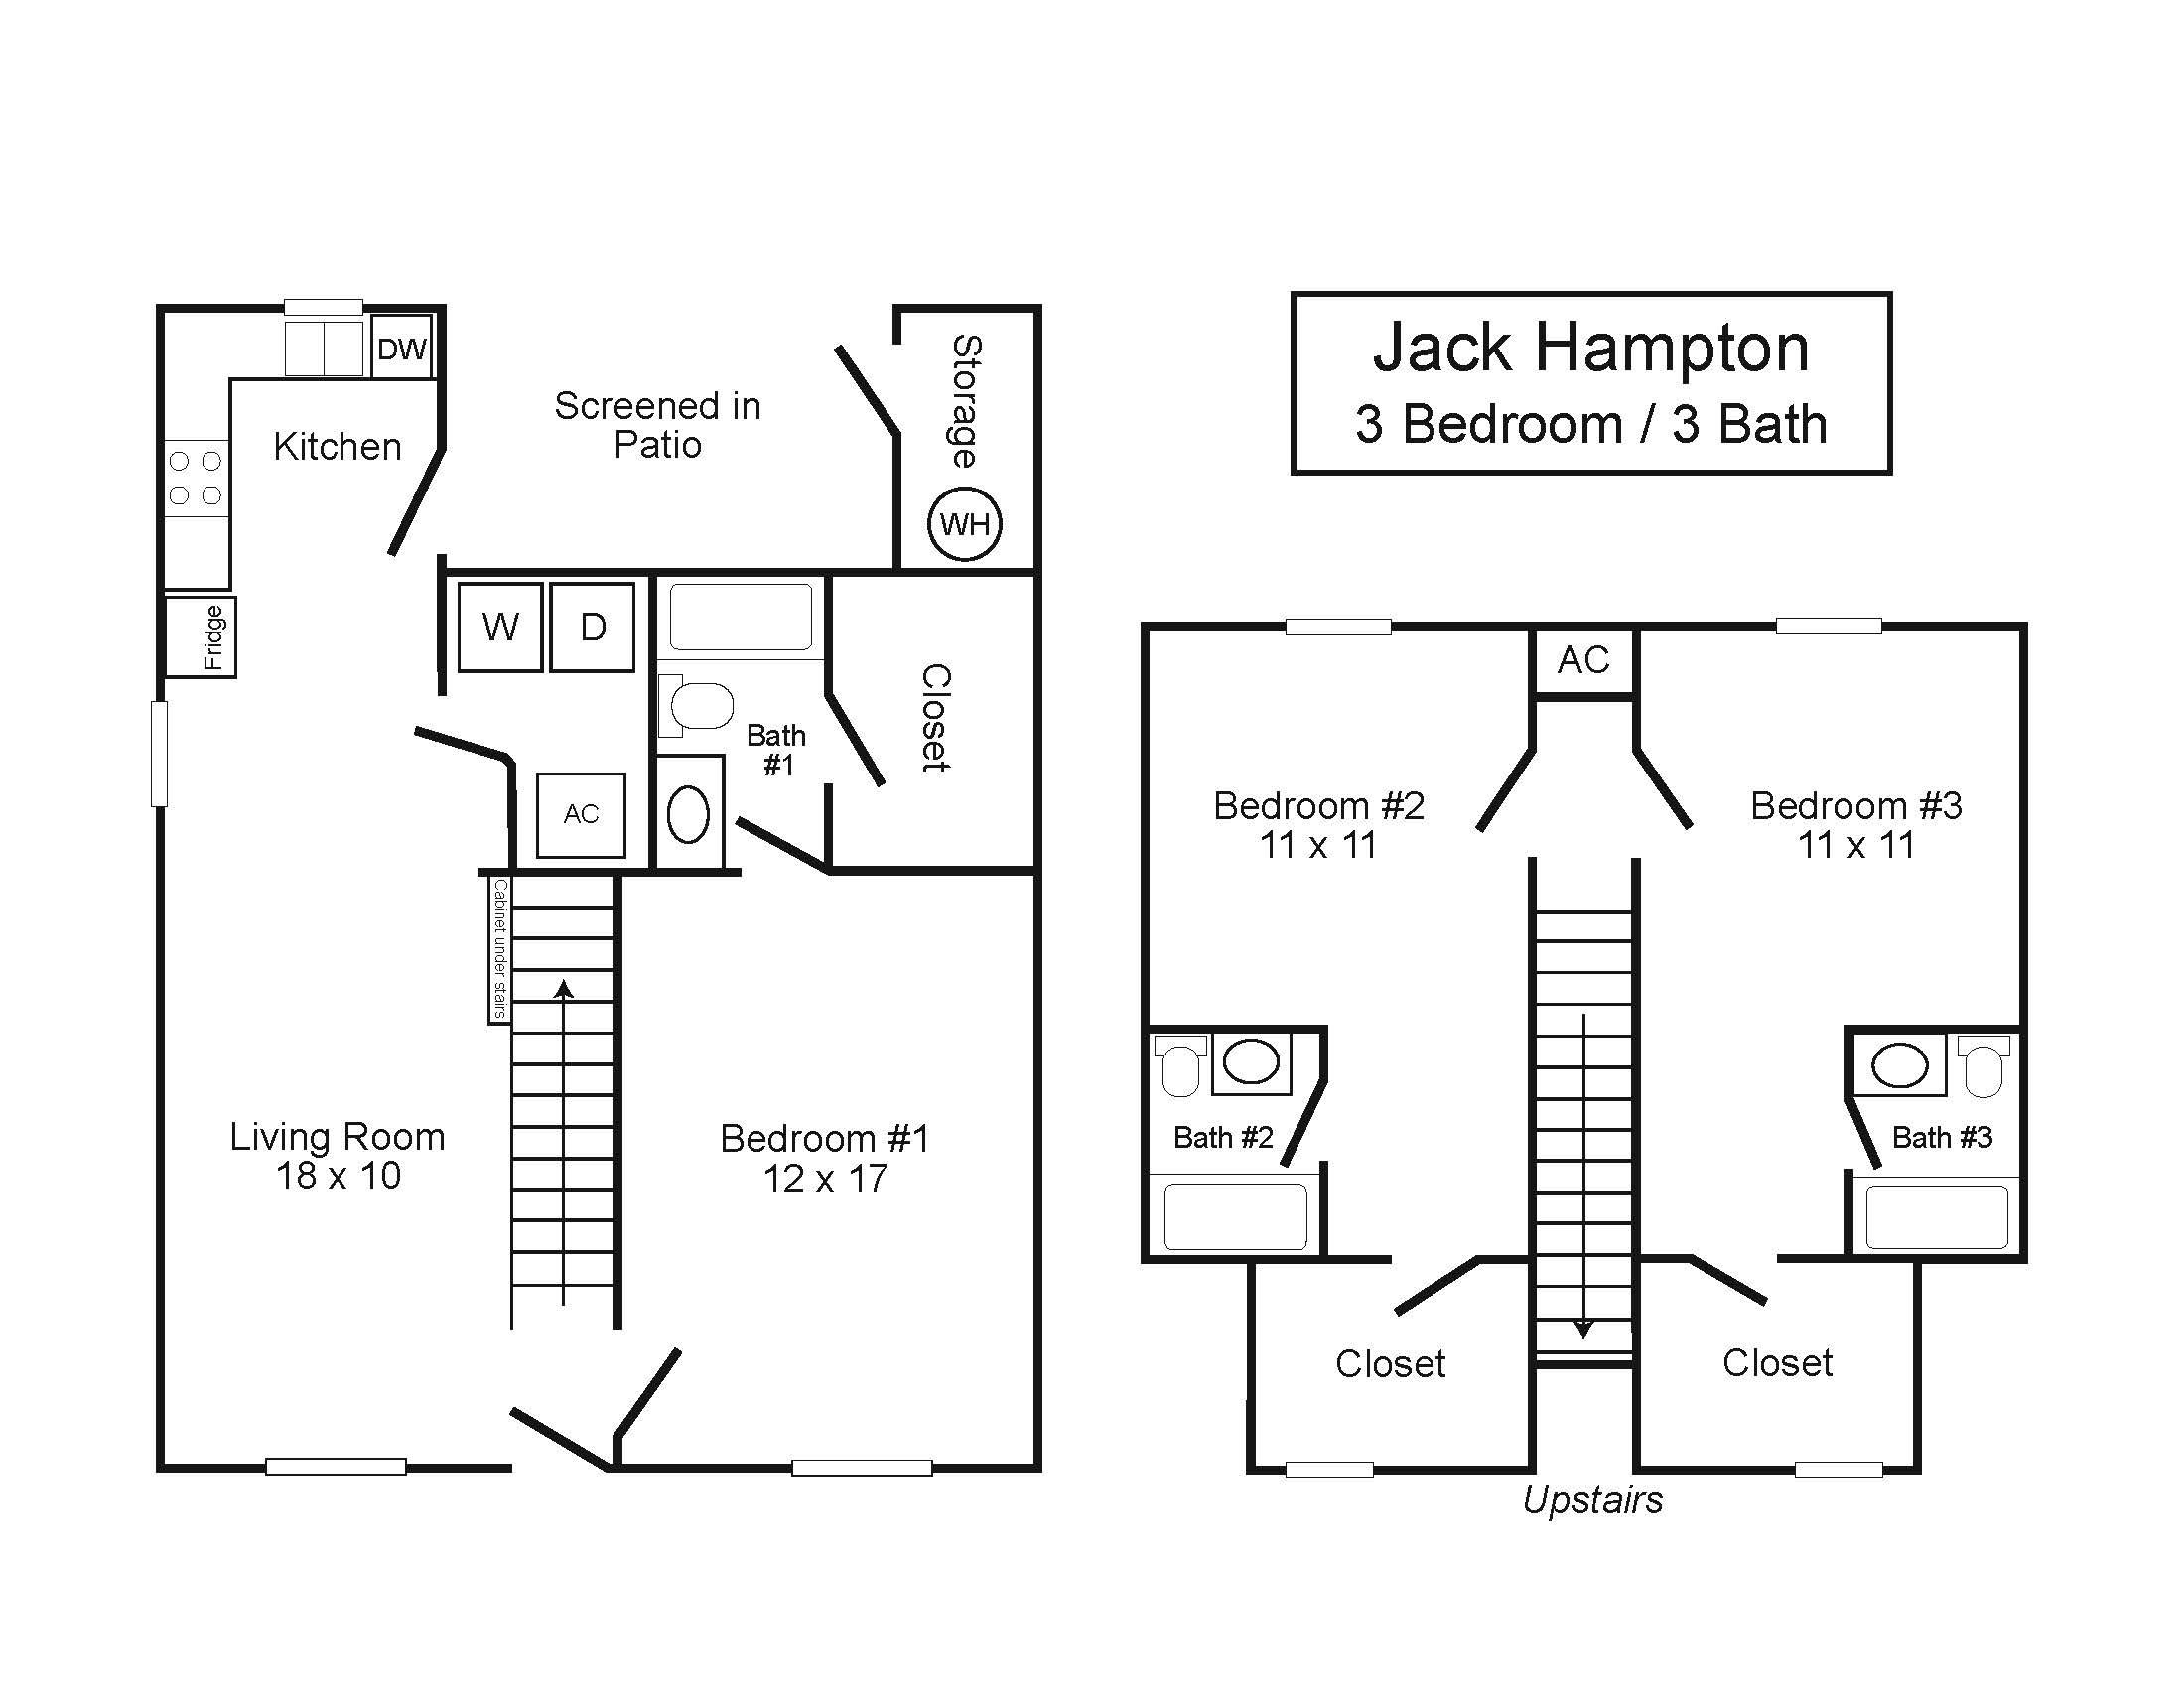 Jack Hampton 3/3